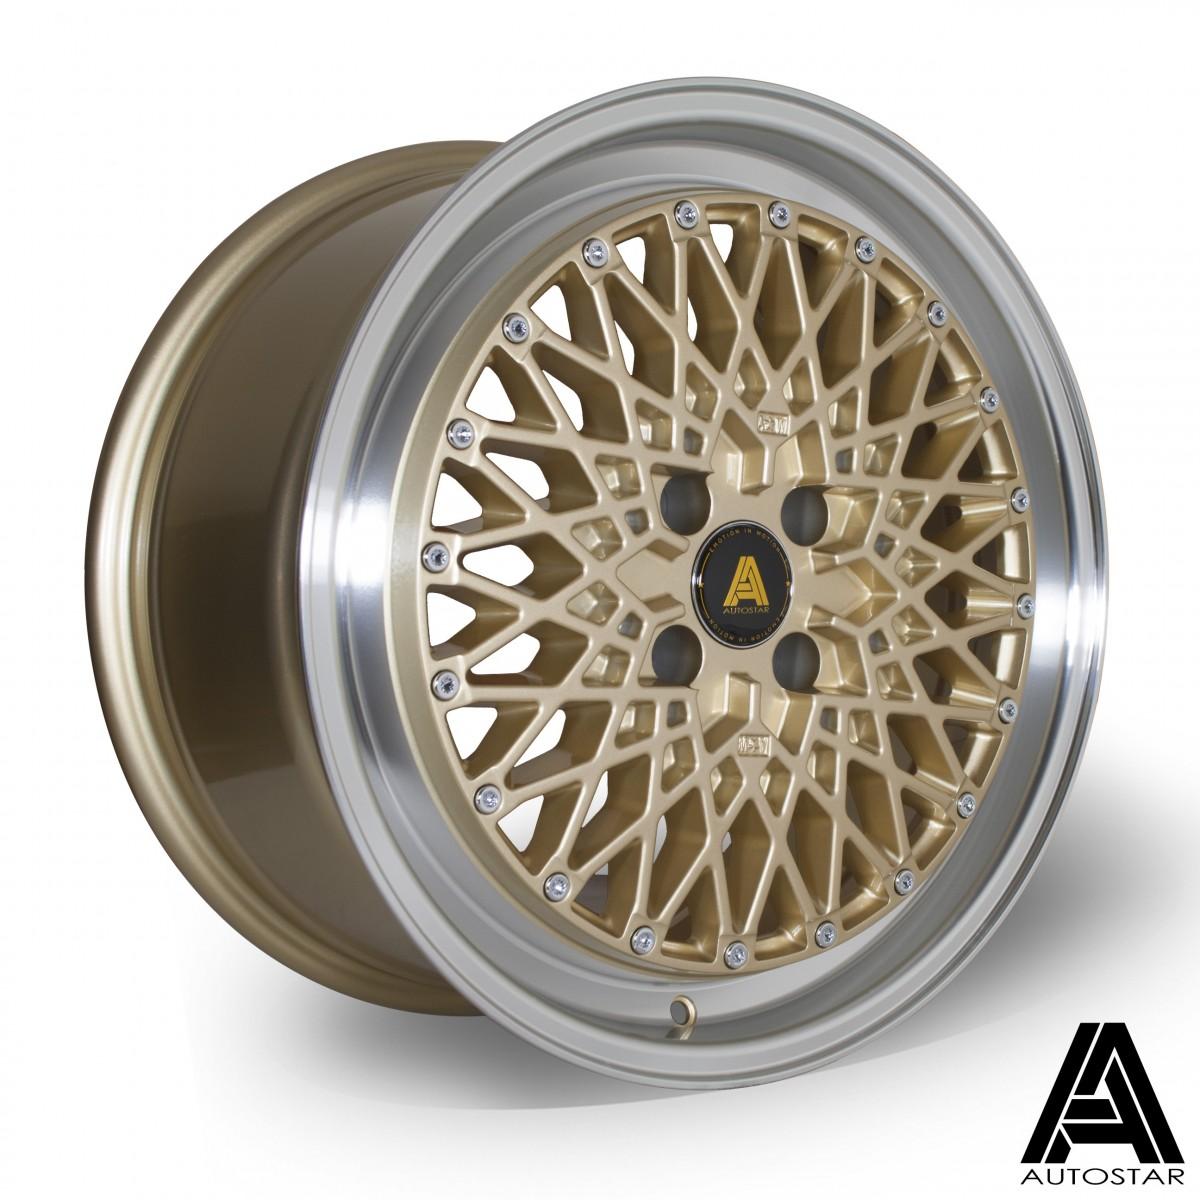 AutoStar Minus 17x8.0 4x100 ET30 Polished with Gold Centre - Set of 4